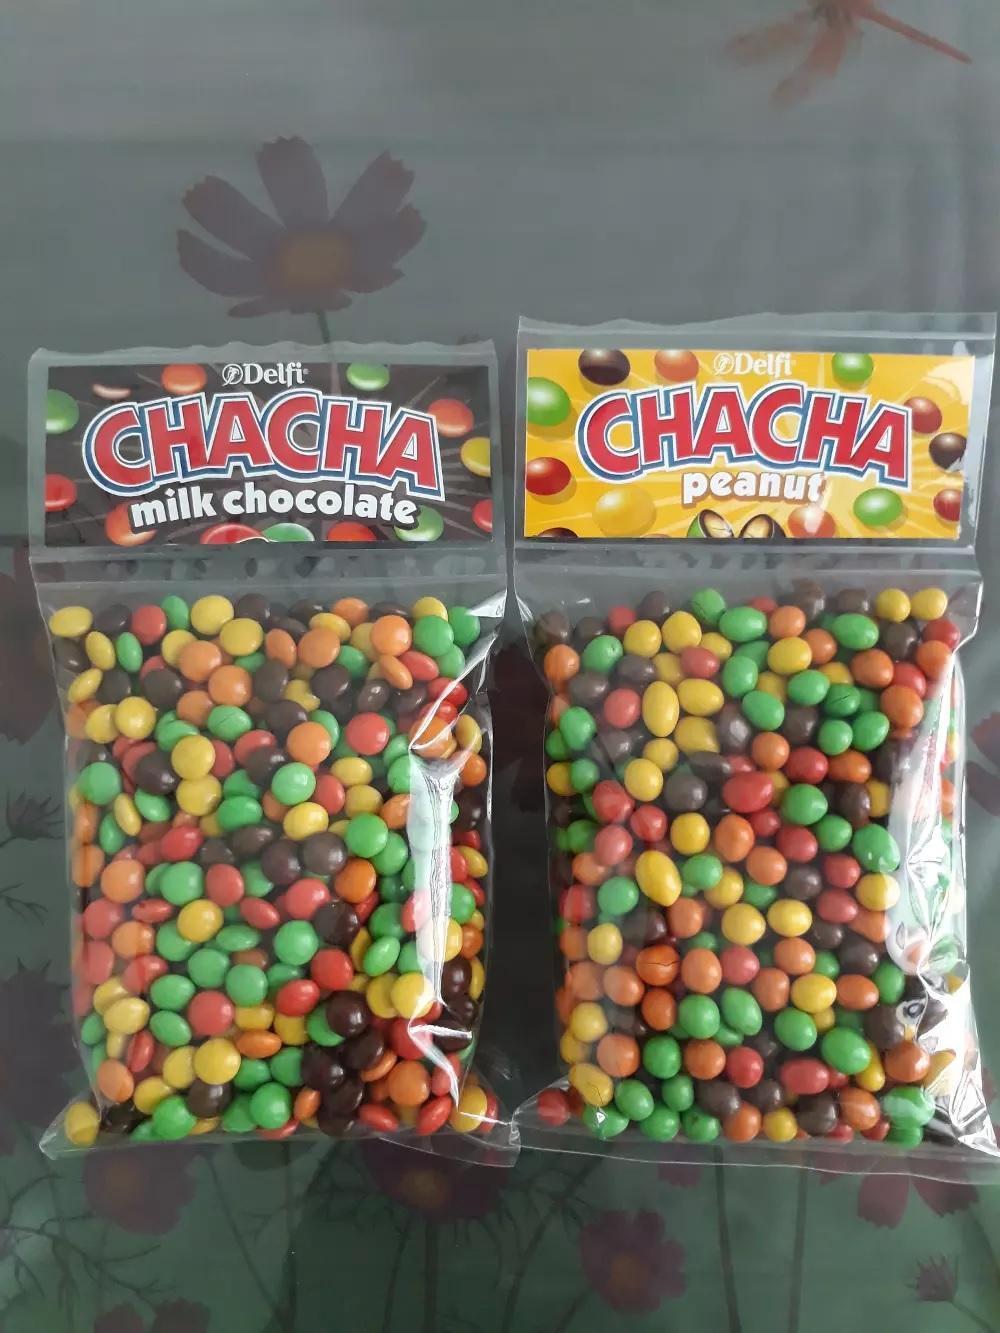 Cha Cha Coklat Delfi Chacha Grosir Cokelat Kiloan 500 Gram Chamilk